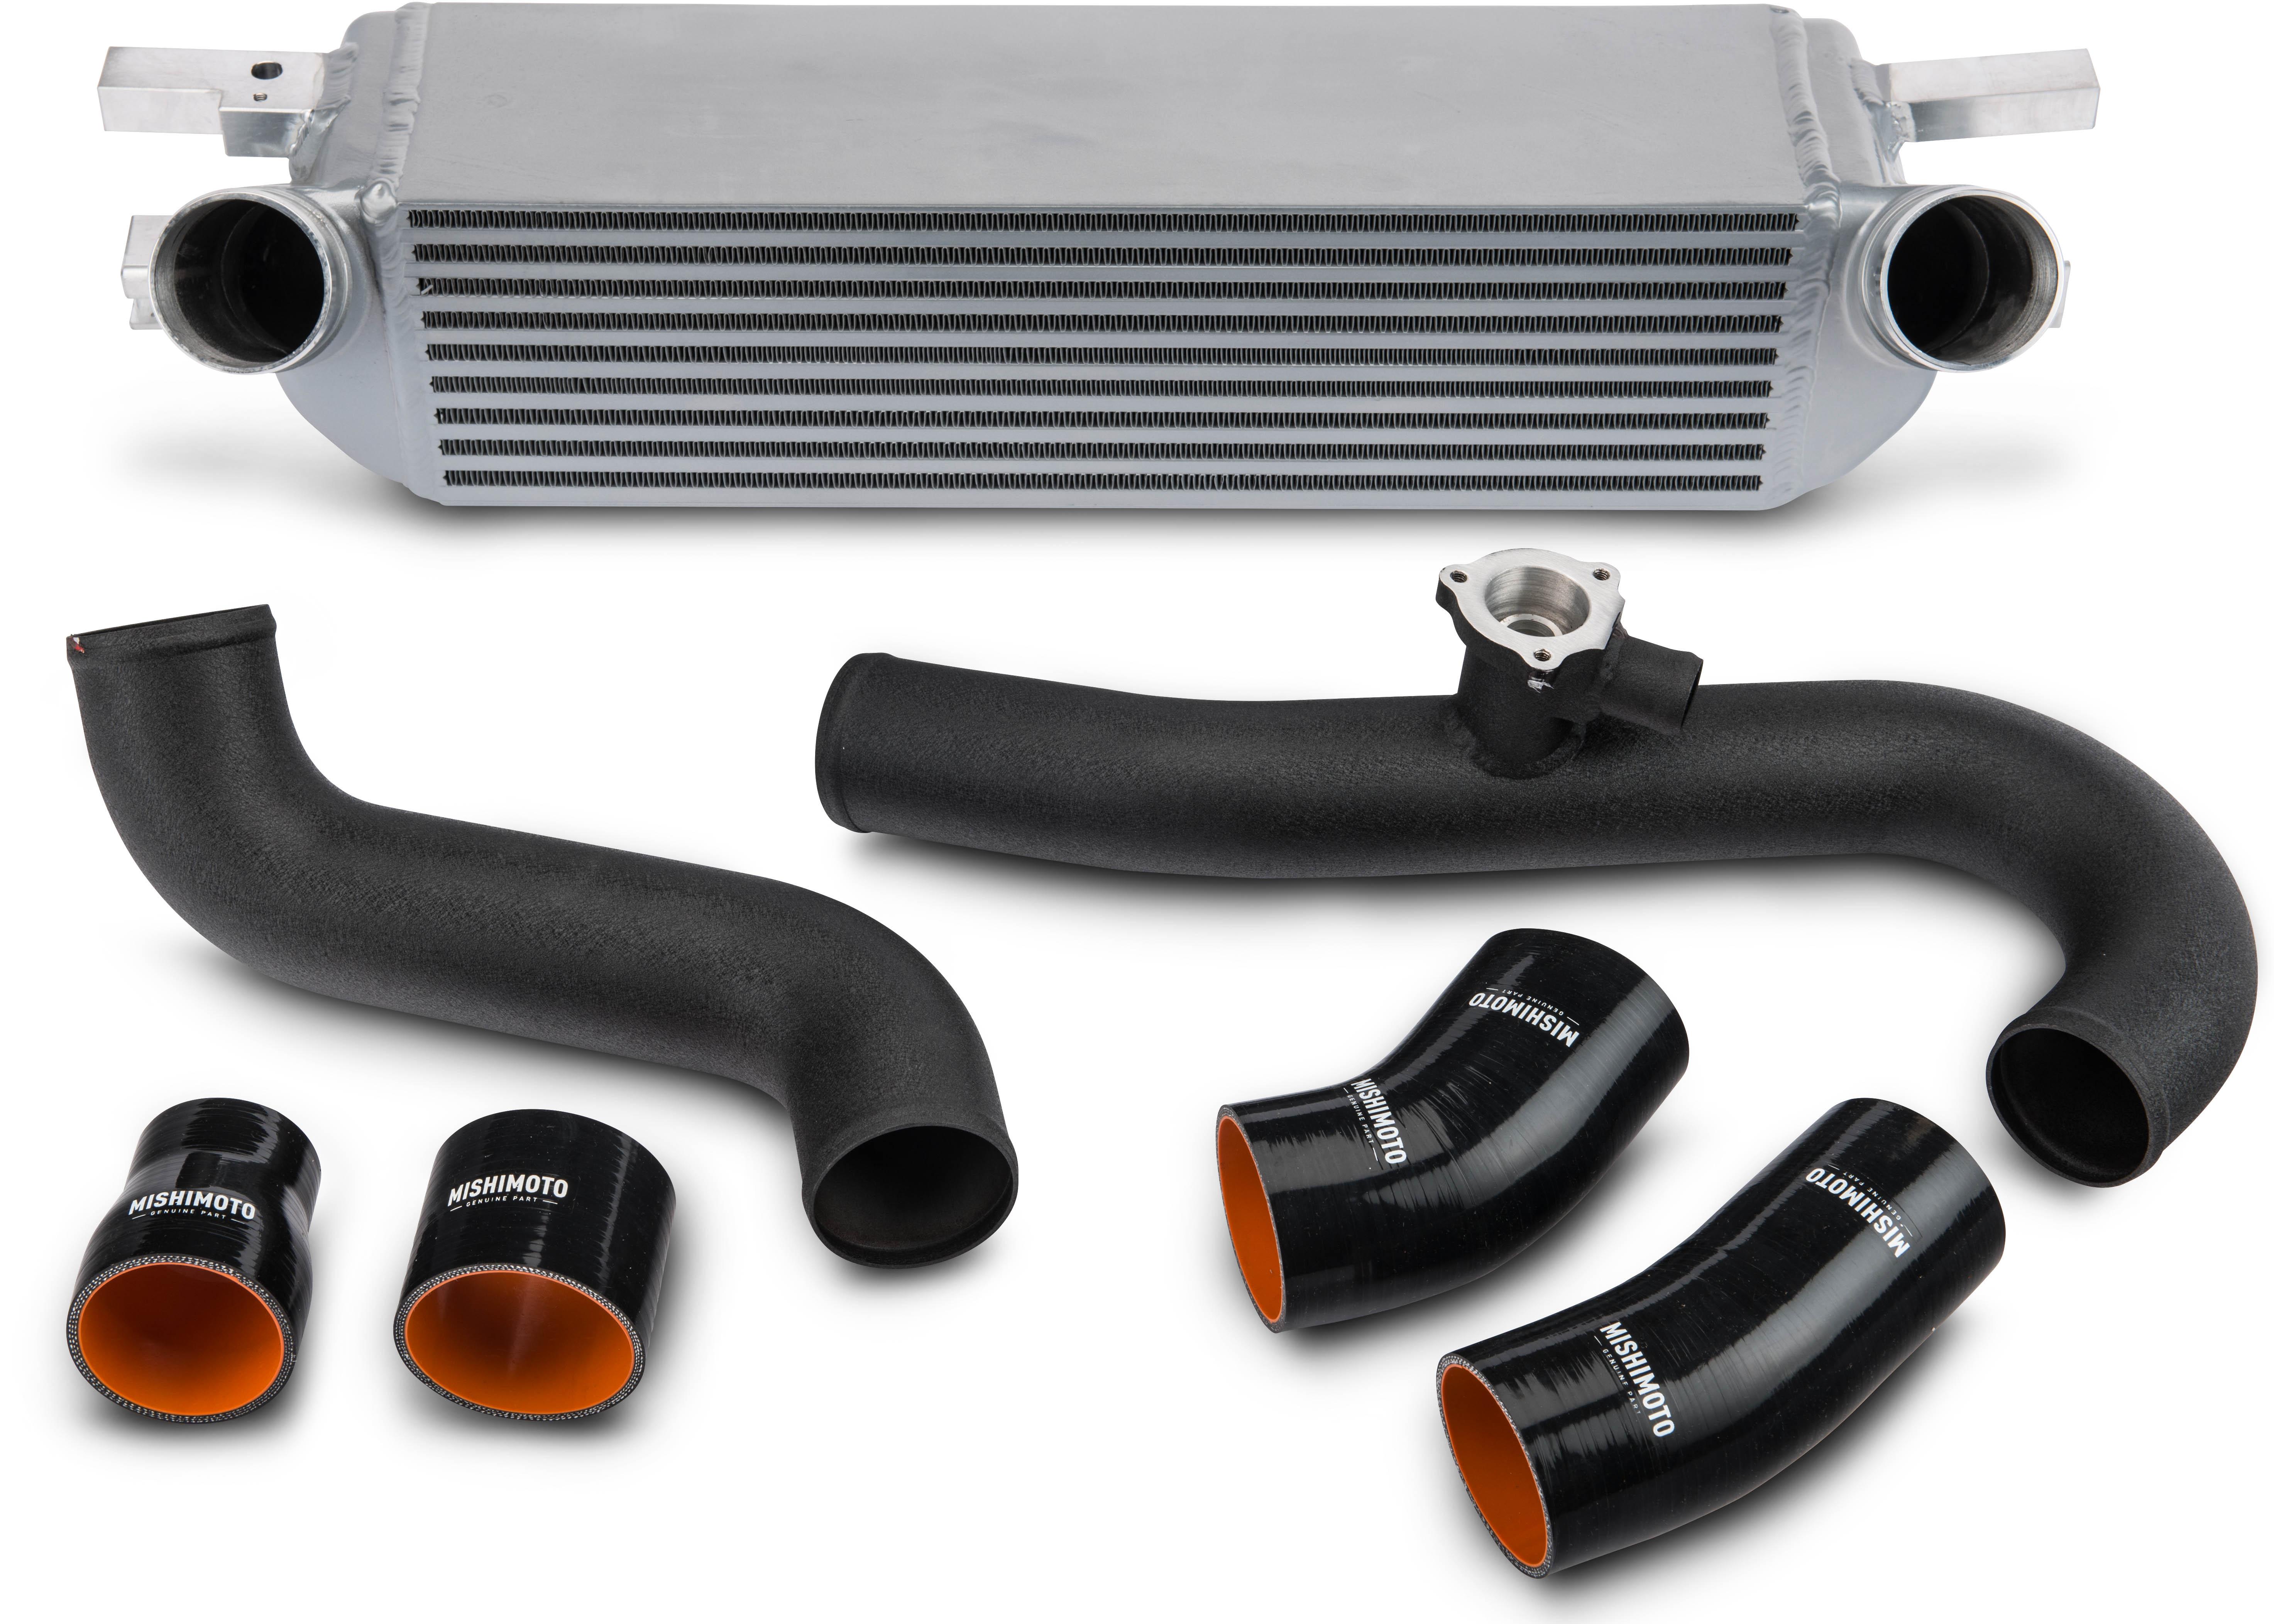 S550 Ecoboost Intercooler Kit